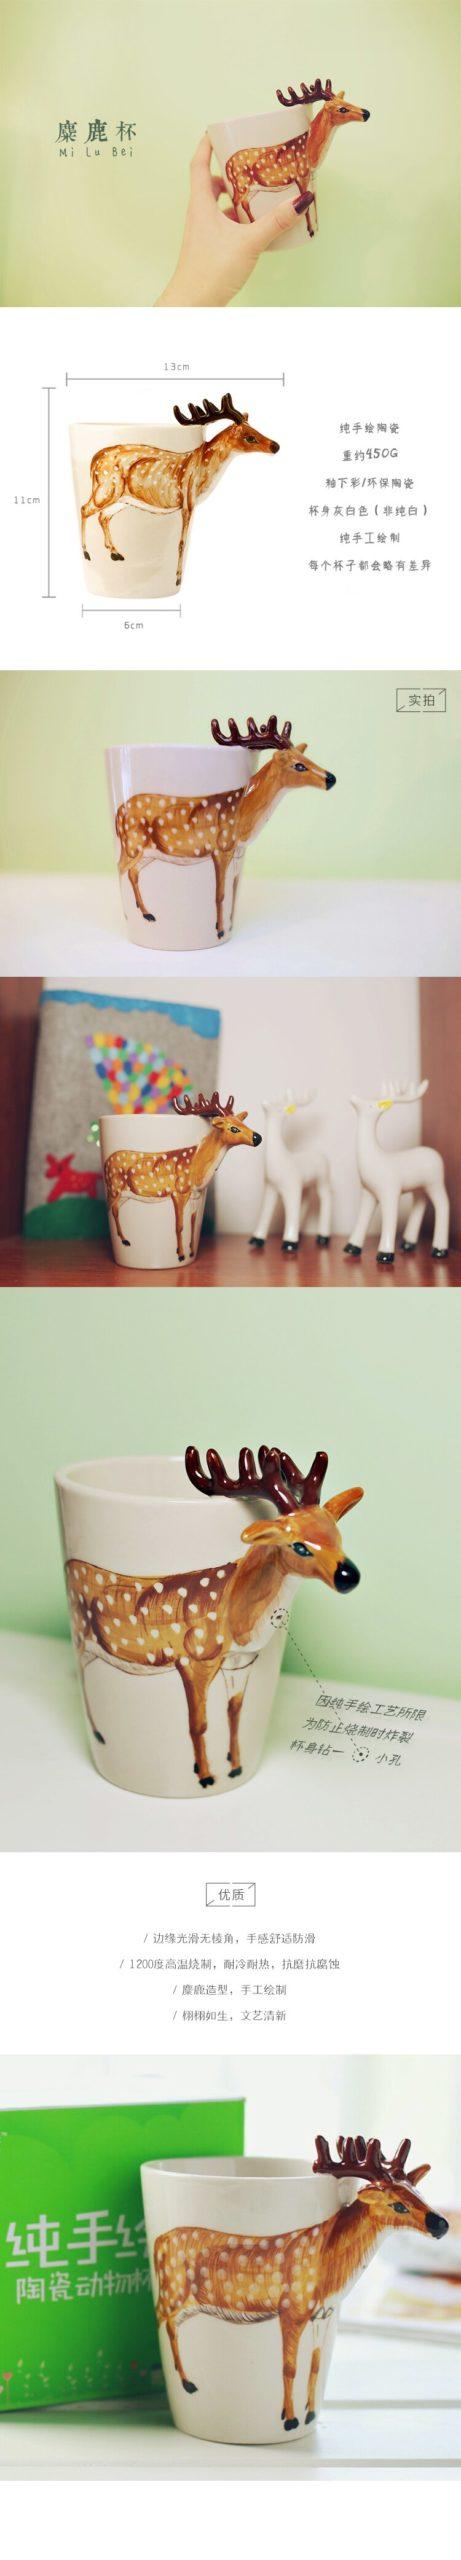 Cute Cat Coffee Mugs Porcelain Dog Cup 3D Painted Travel Coffee Mug Milk Tea Kids Cup Coffee Mugs Anime Enamel Mug Taza Hot Sale